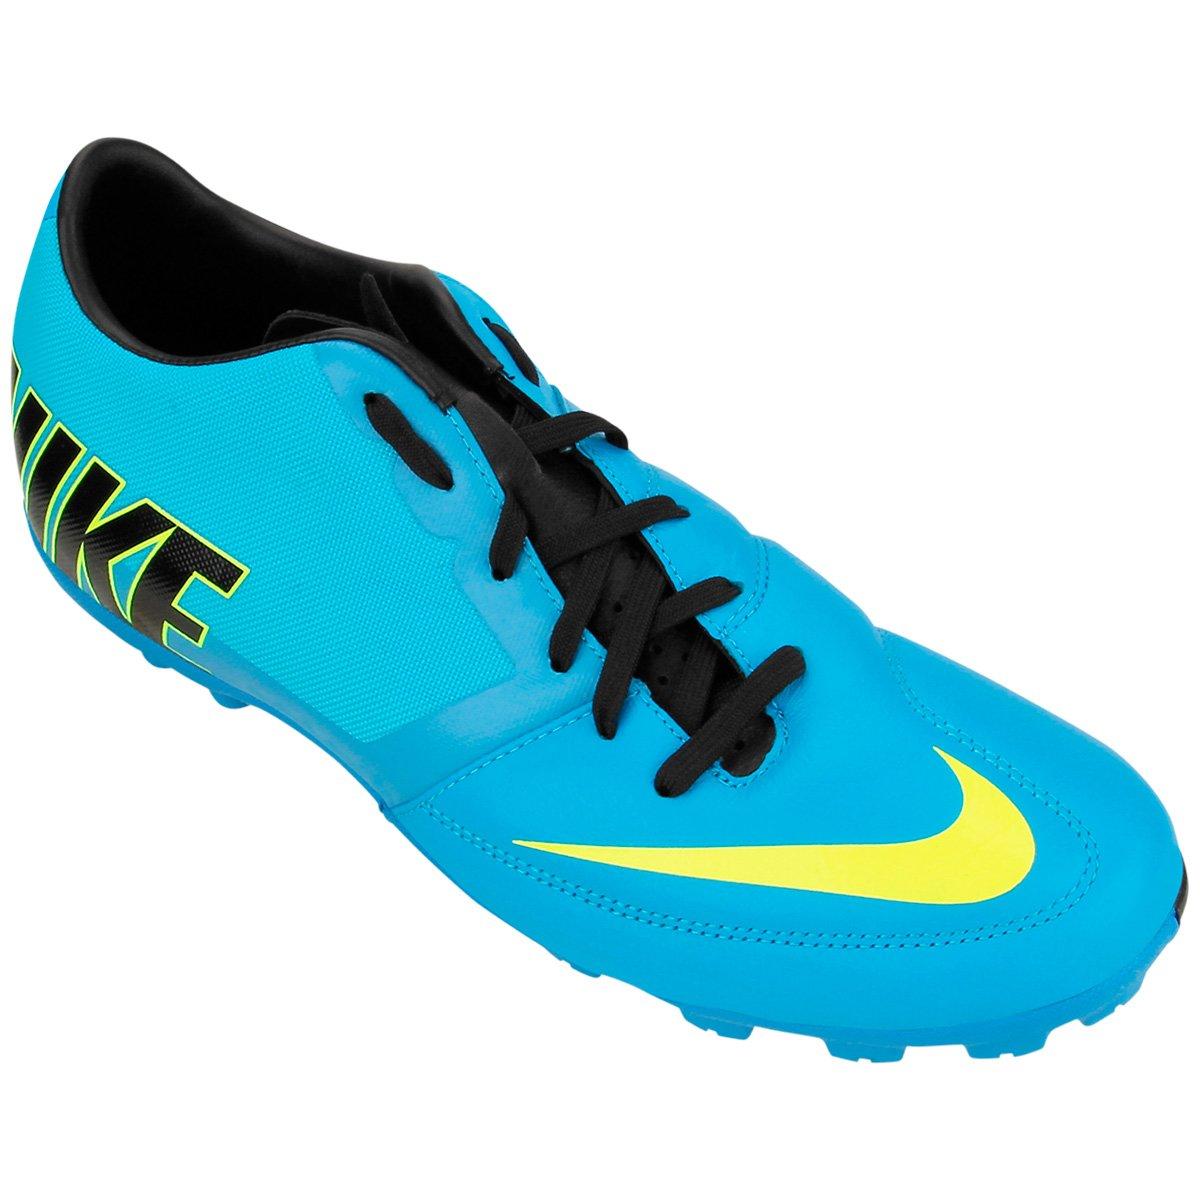 Chuteira Nike 5 Bomba Pro 2 - Compre Agora  04b7675d9a271